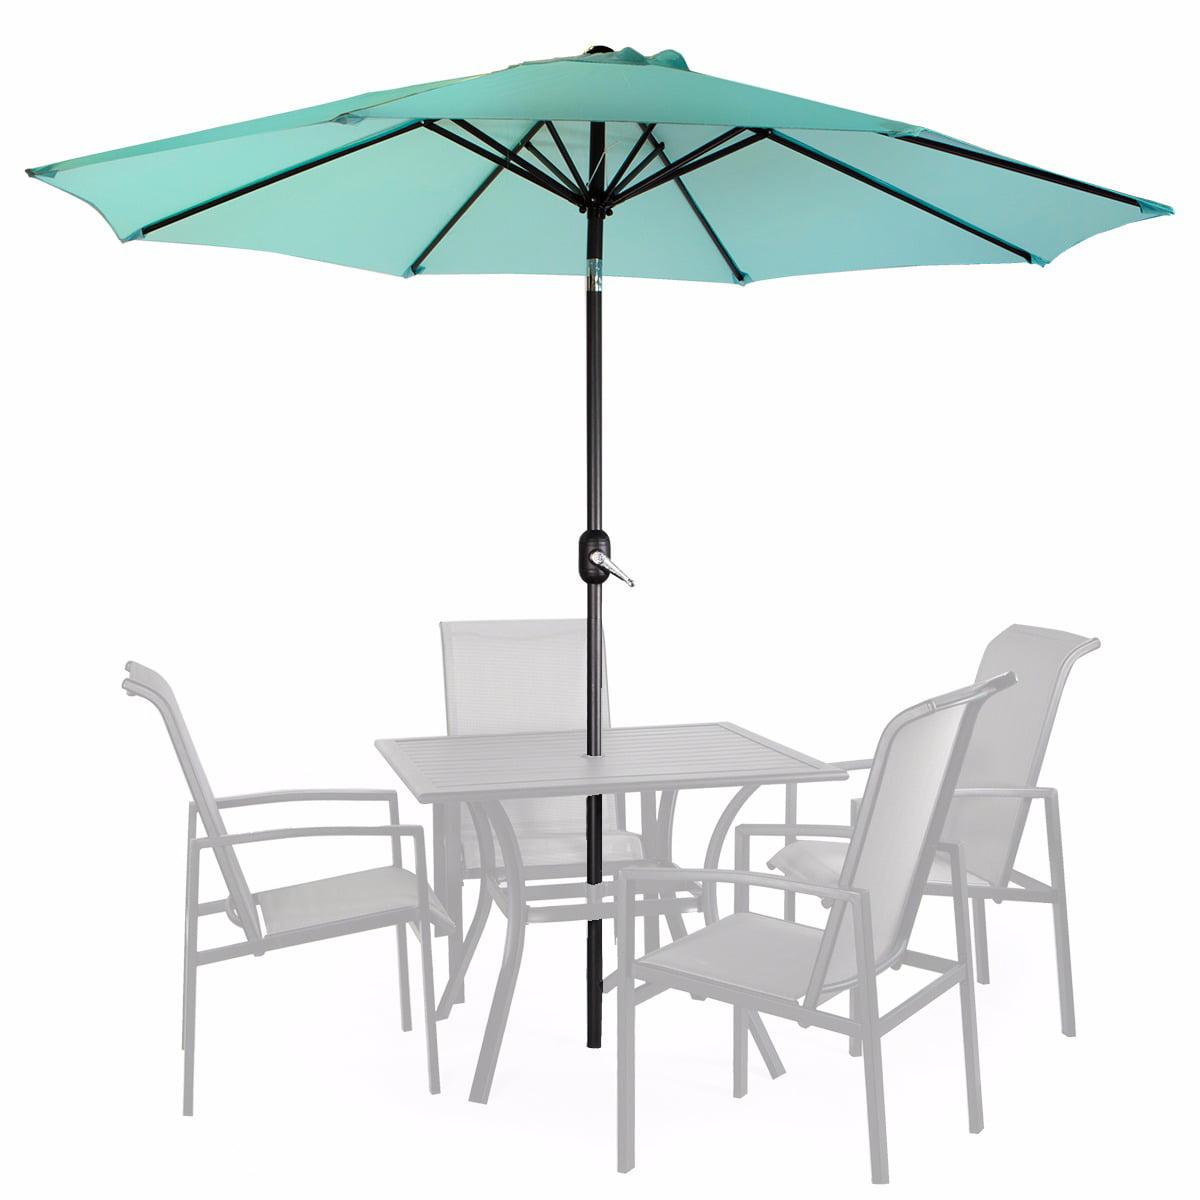 BCP 9ft Outdoor Market Patio Umbrella w// Crank Tilt Adjustment Wind Vent